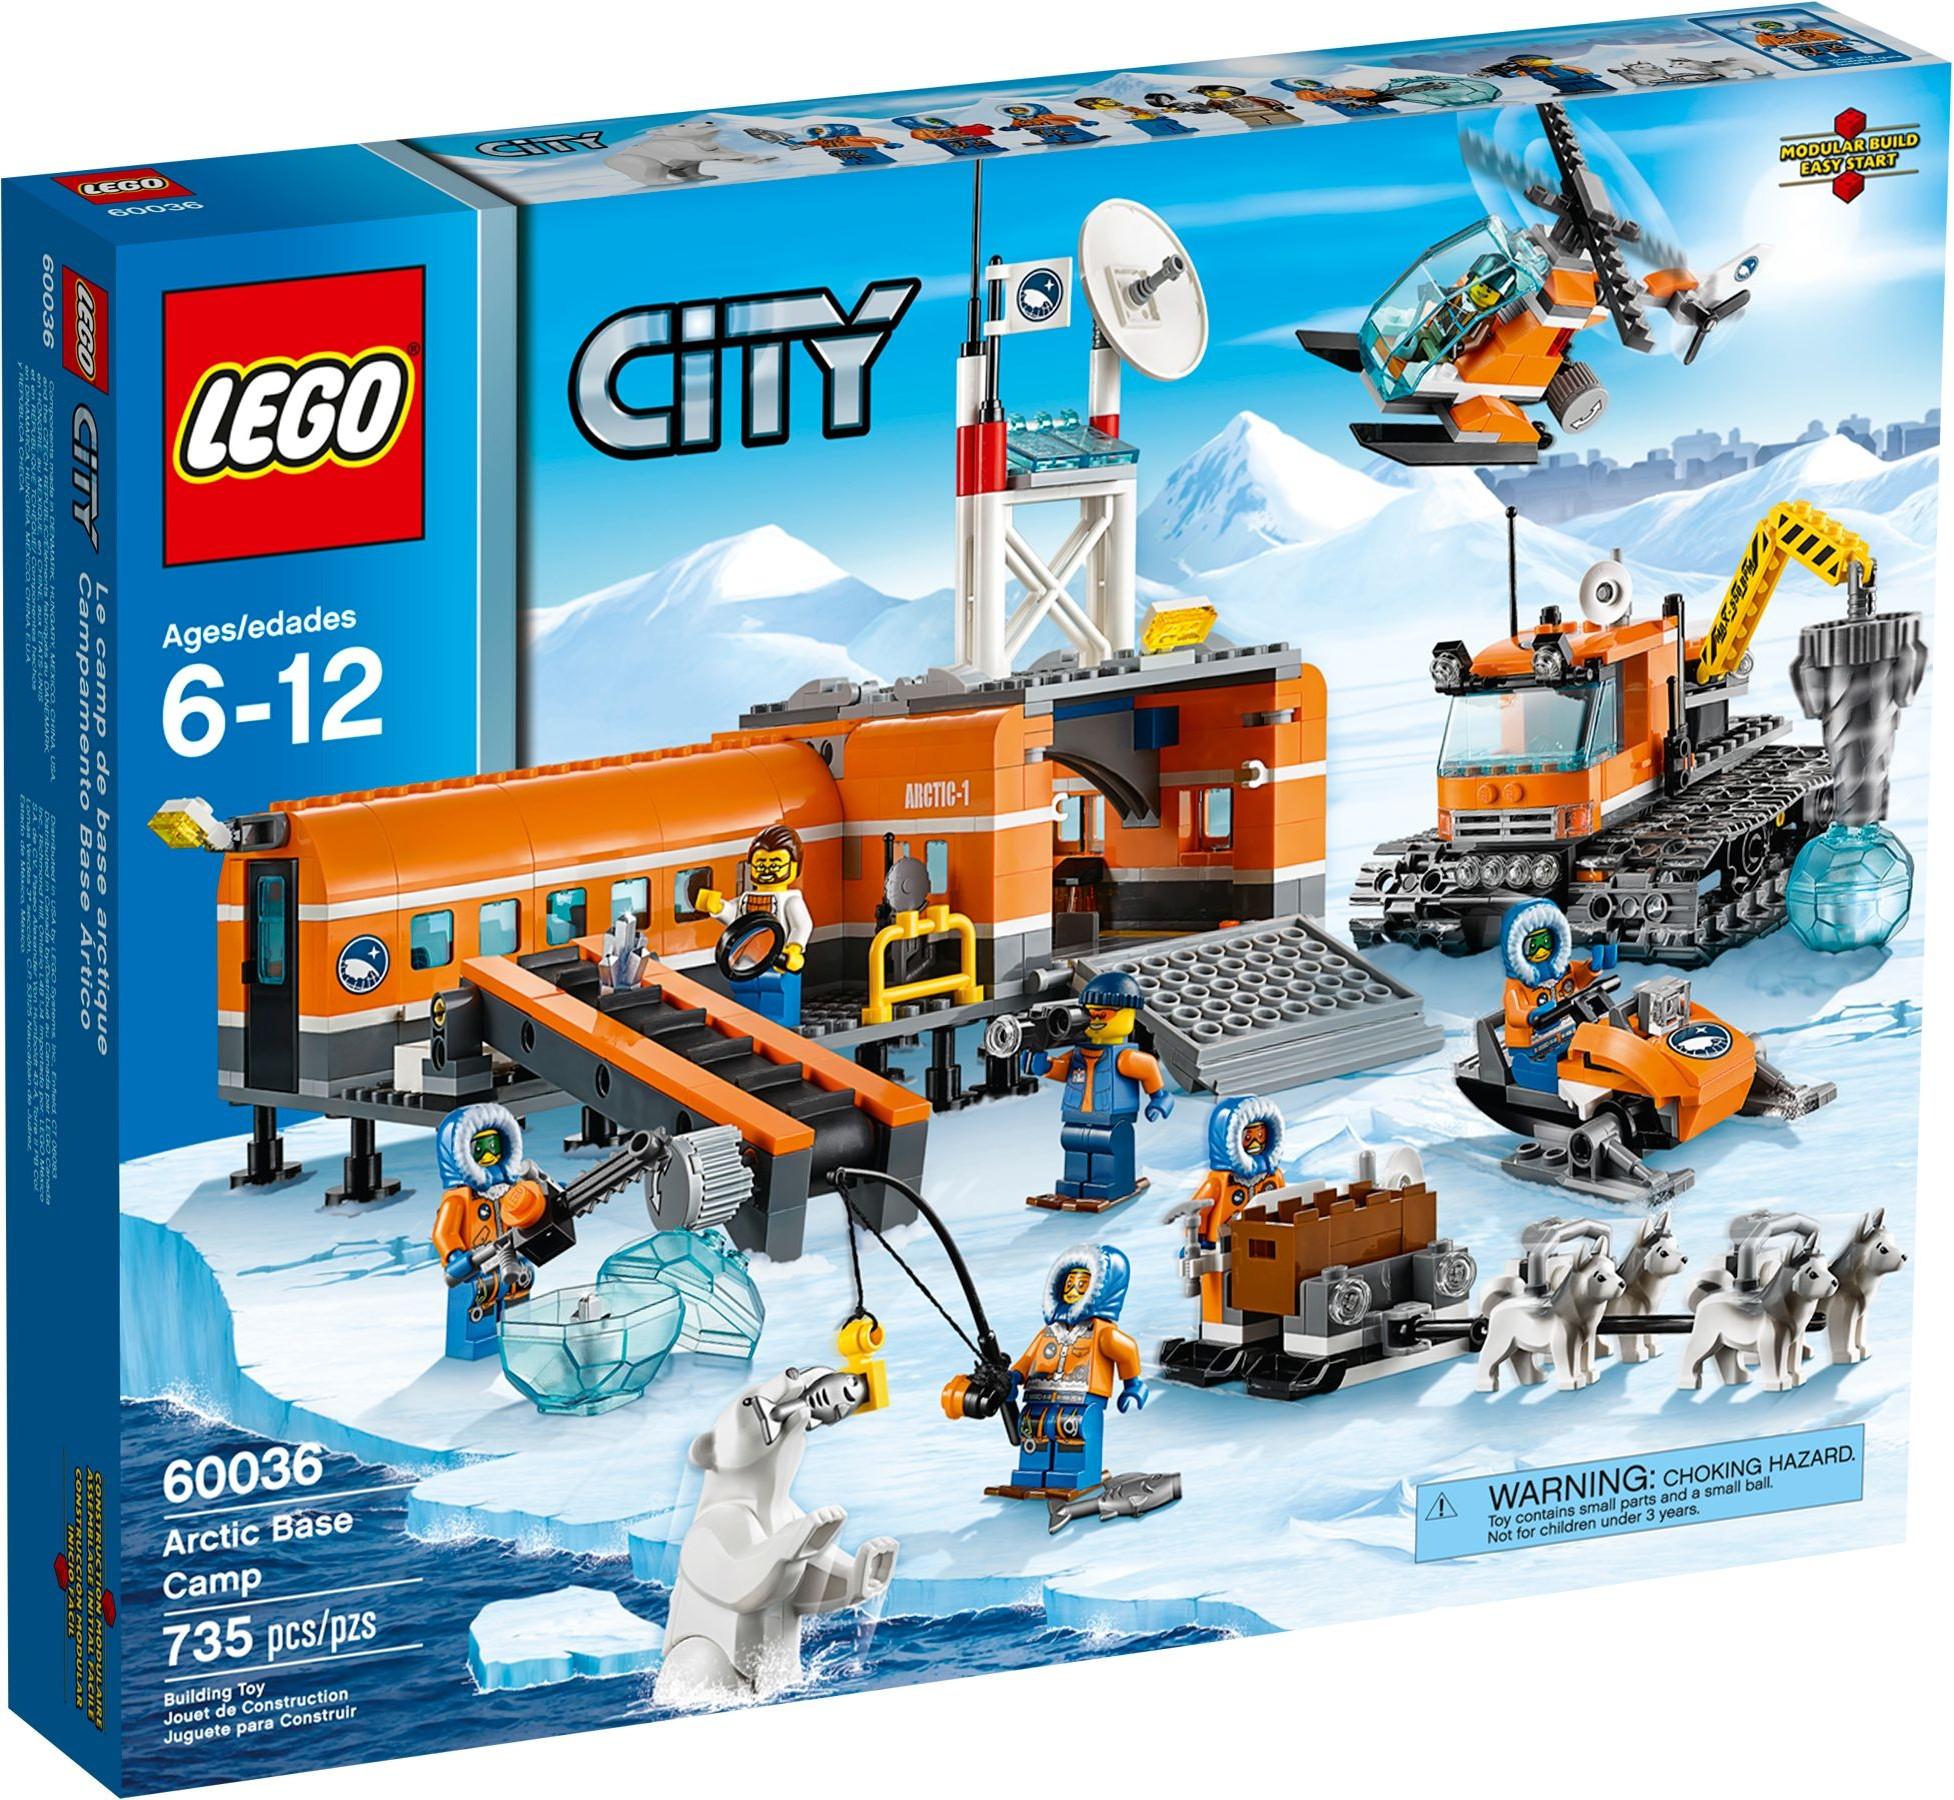 LEGO 60036 - City - Arctic Base Camp